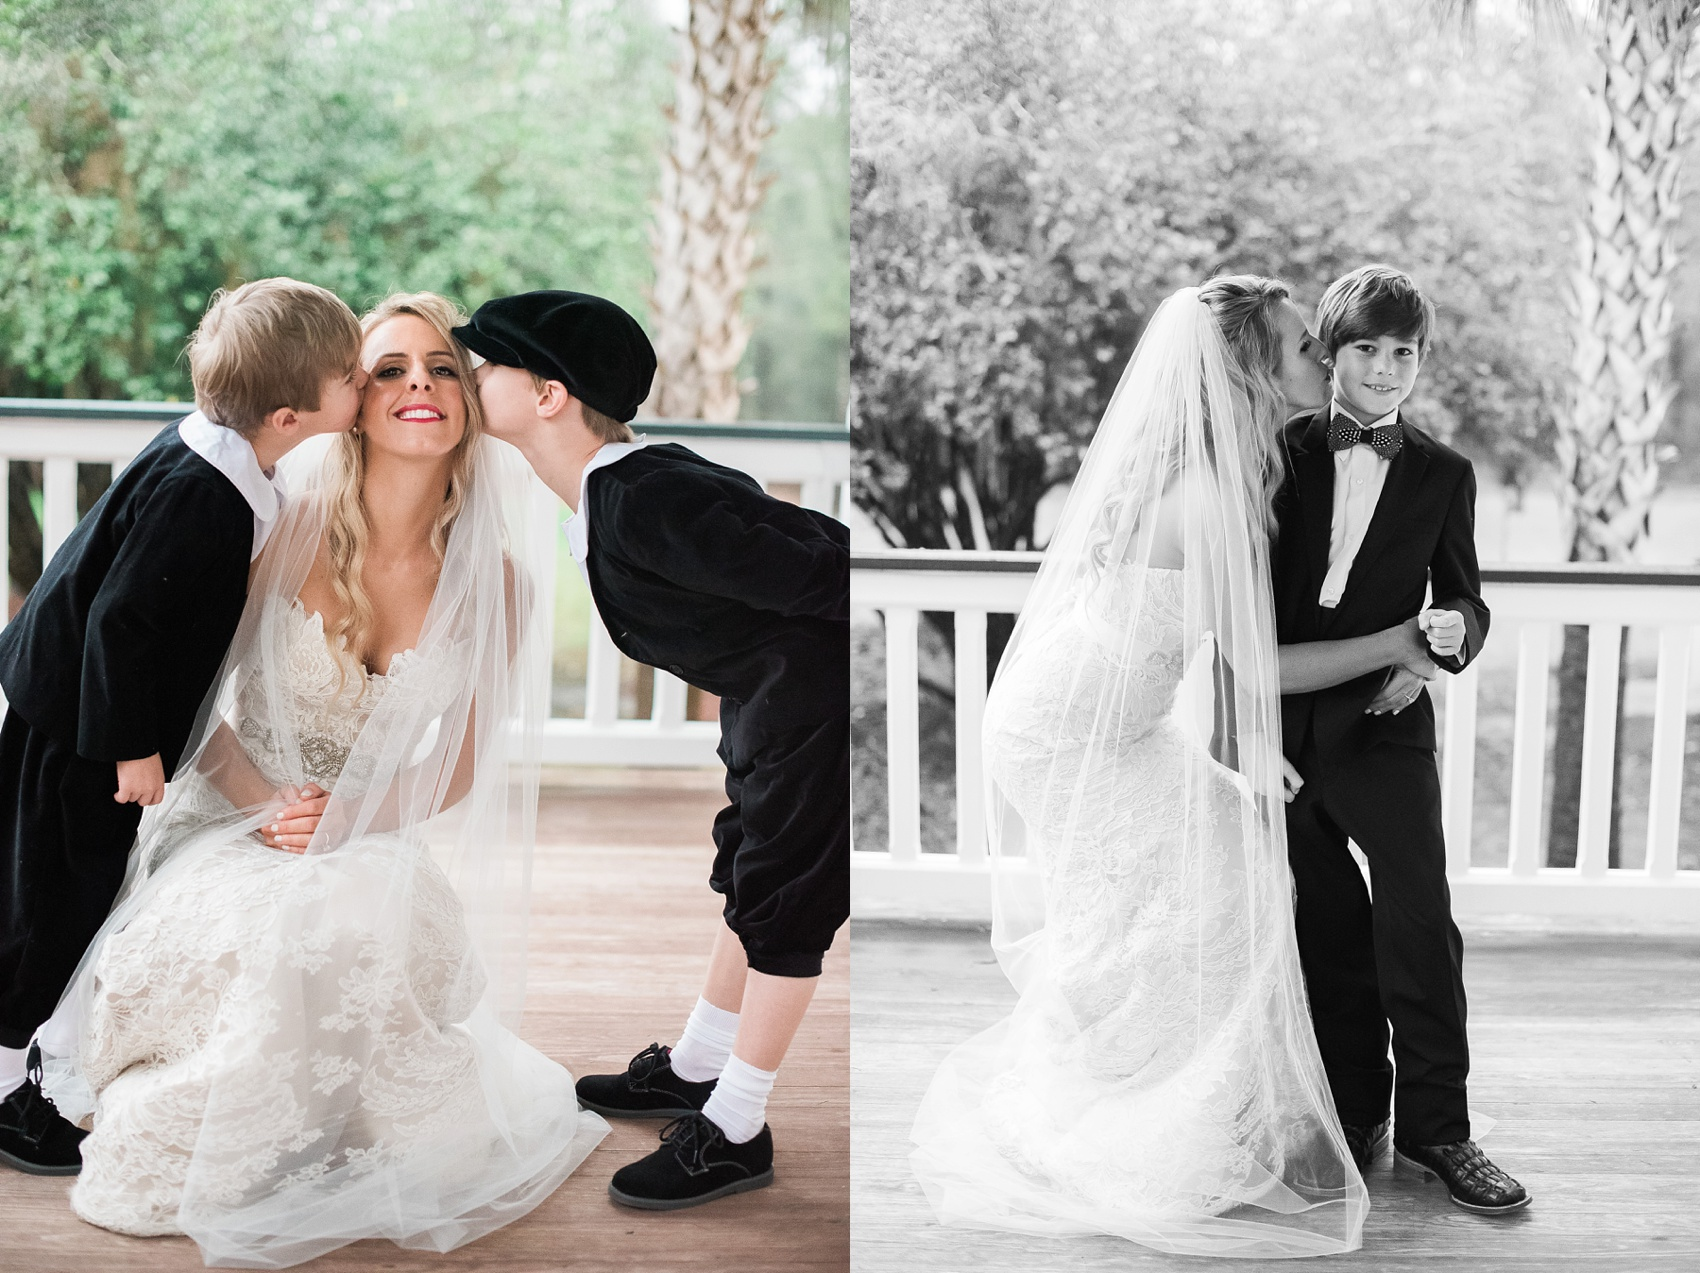 South_carolina_wedding_photographer_0065.jpg